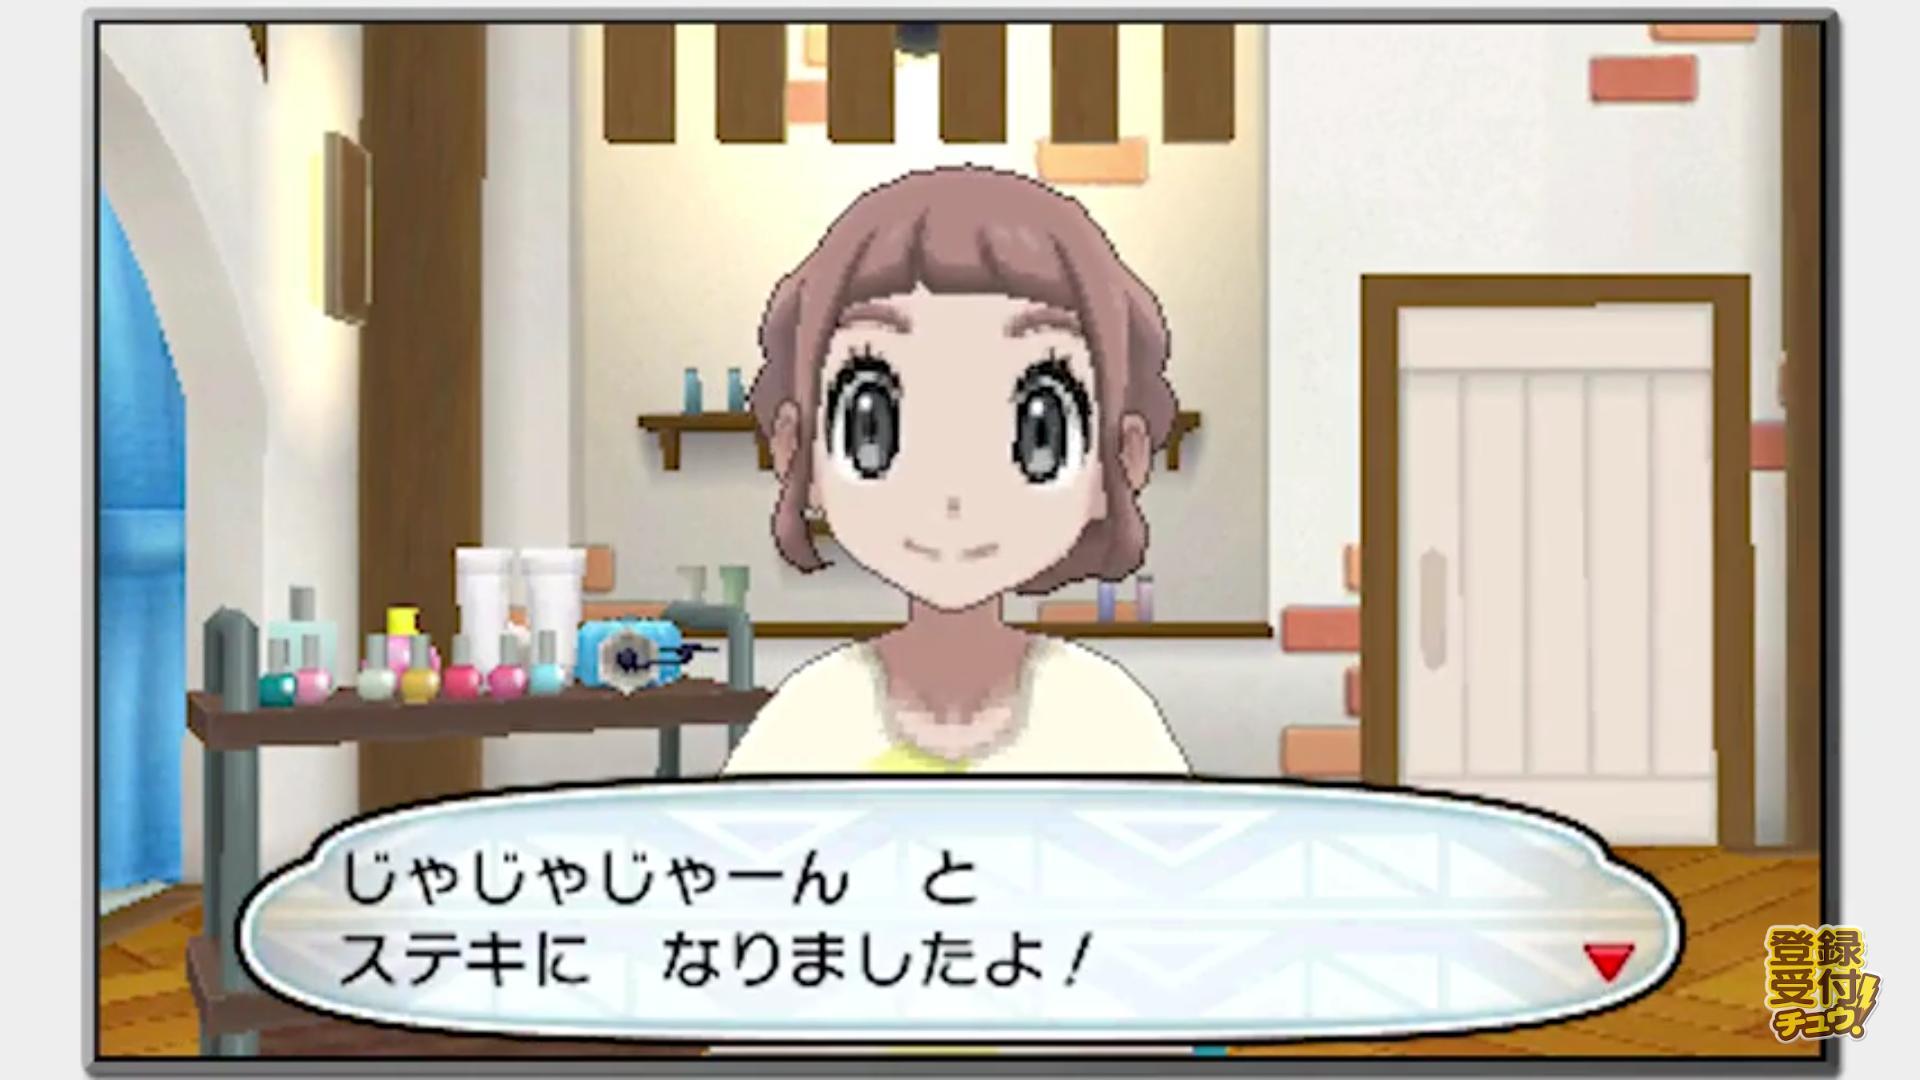 3ds『ポケモン サン・ムーン』、お着替え髪型復活! - n-life